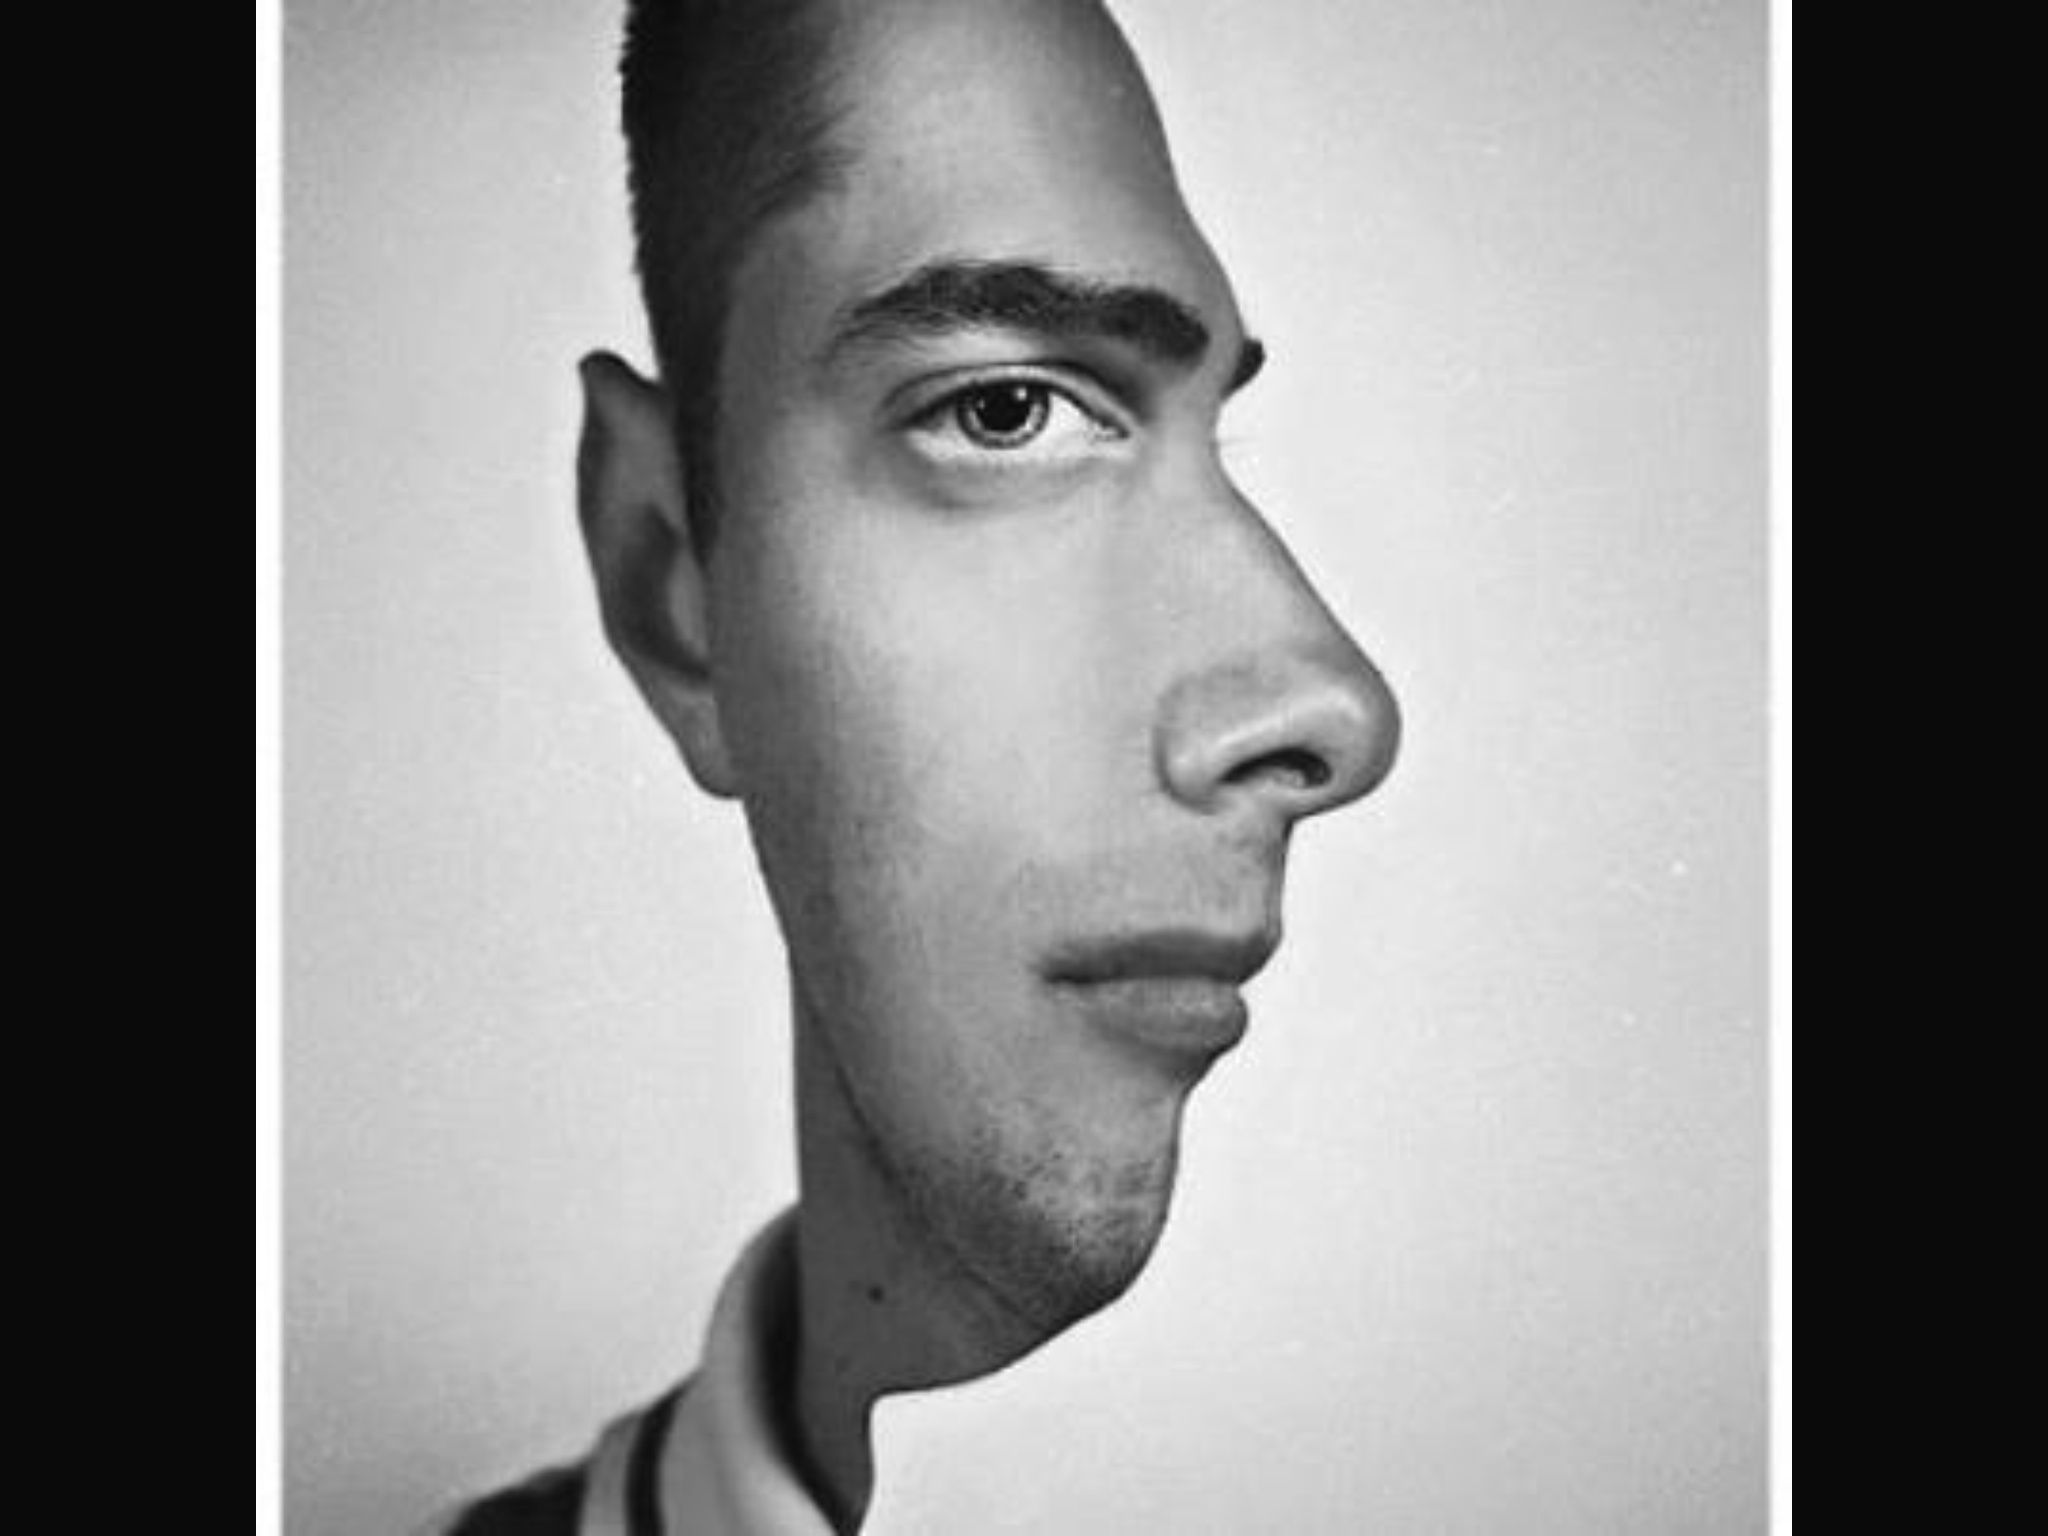 faces optical illusions illusion funny two